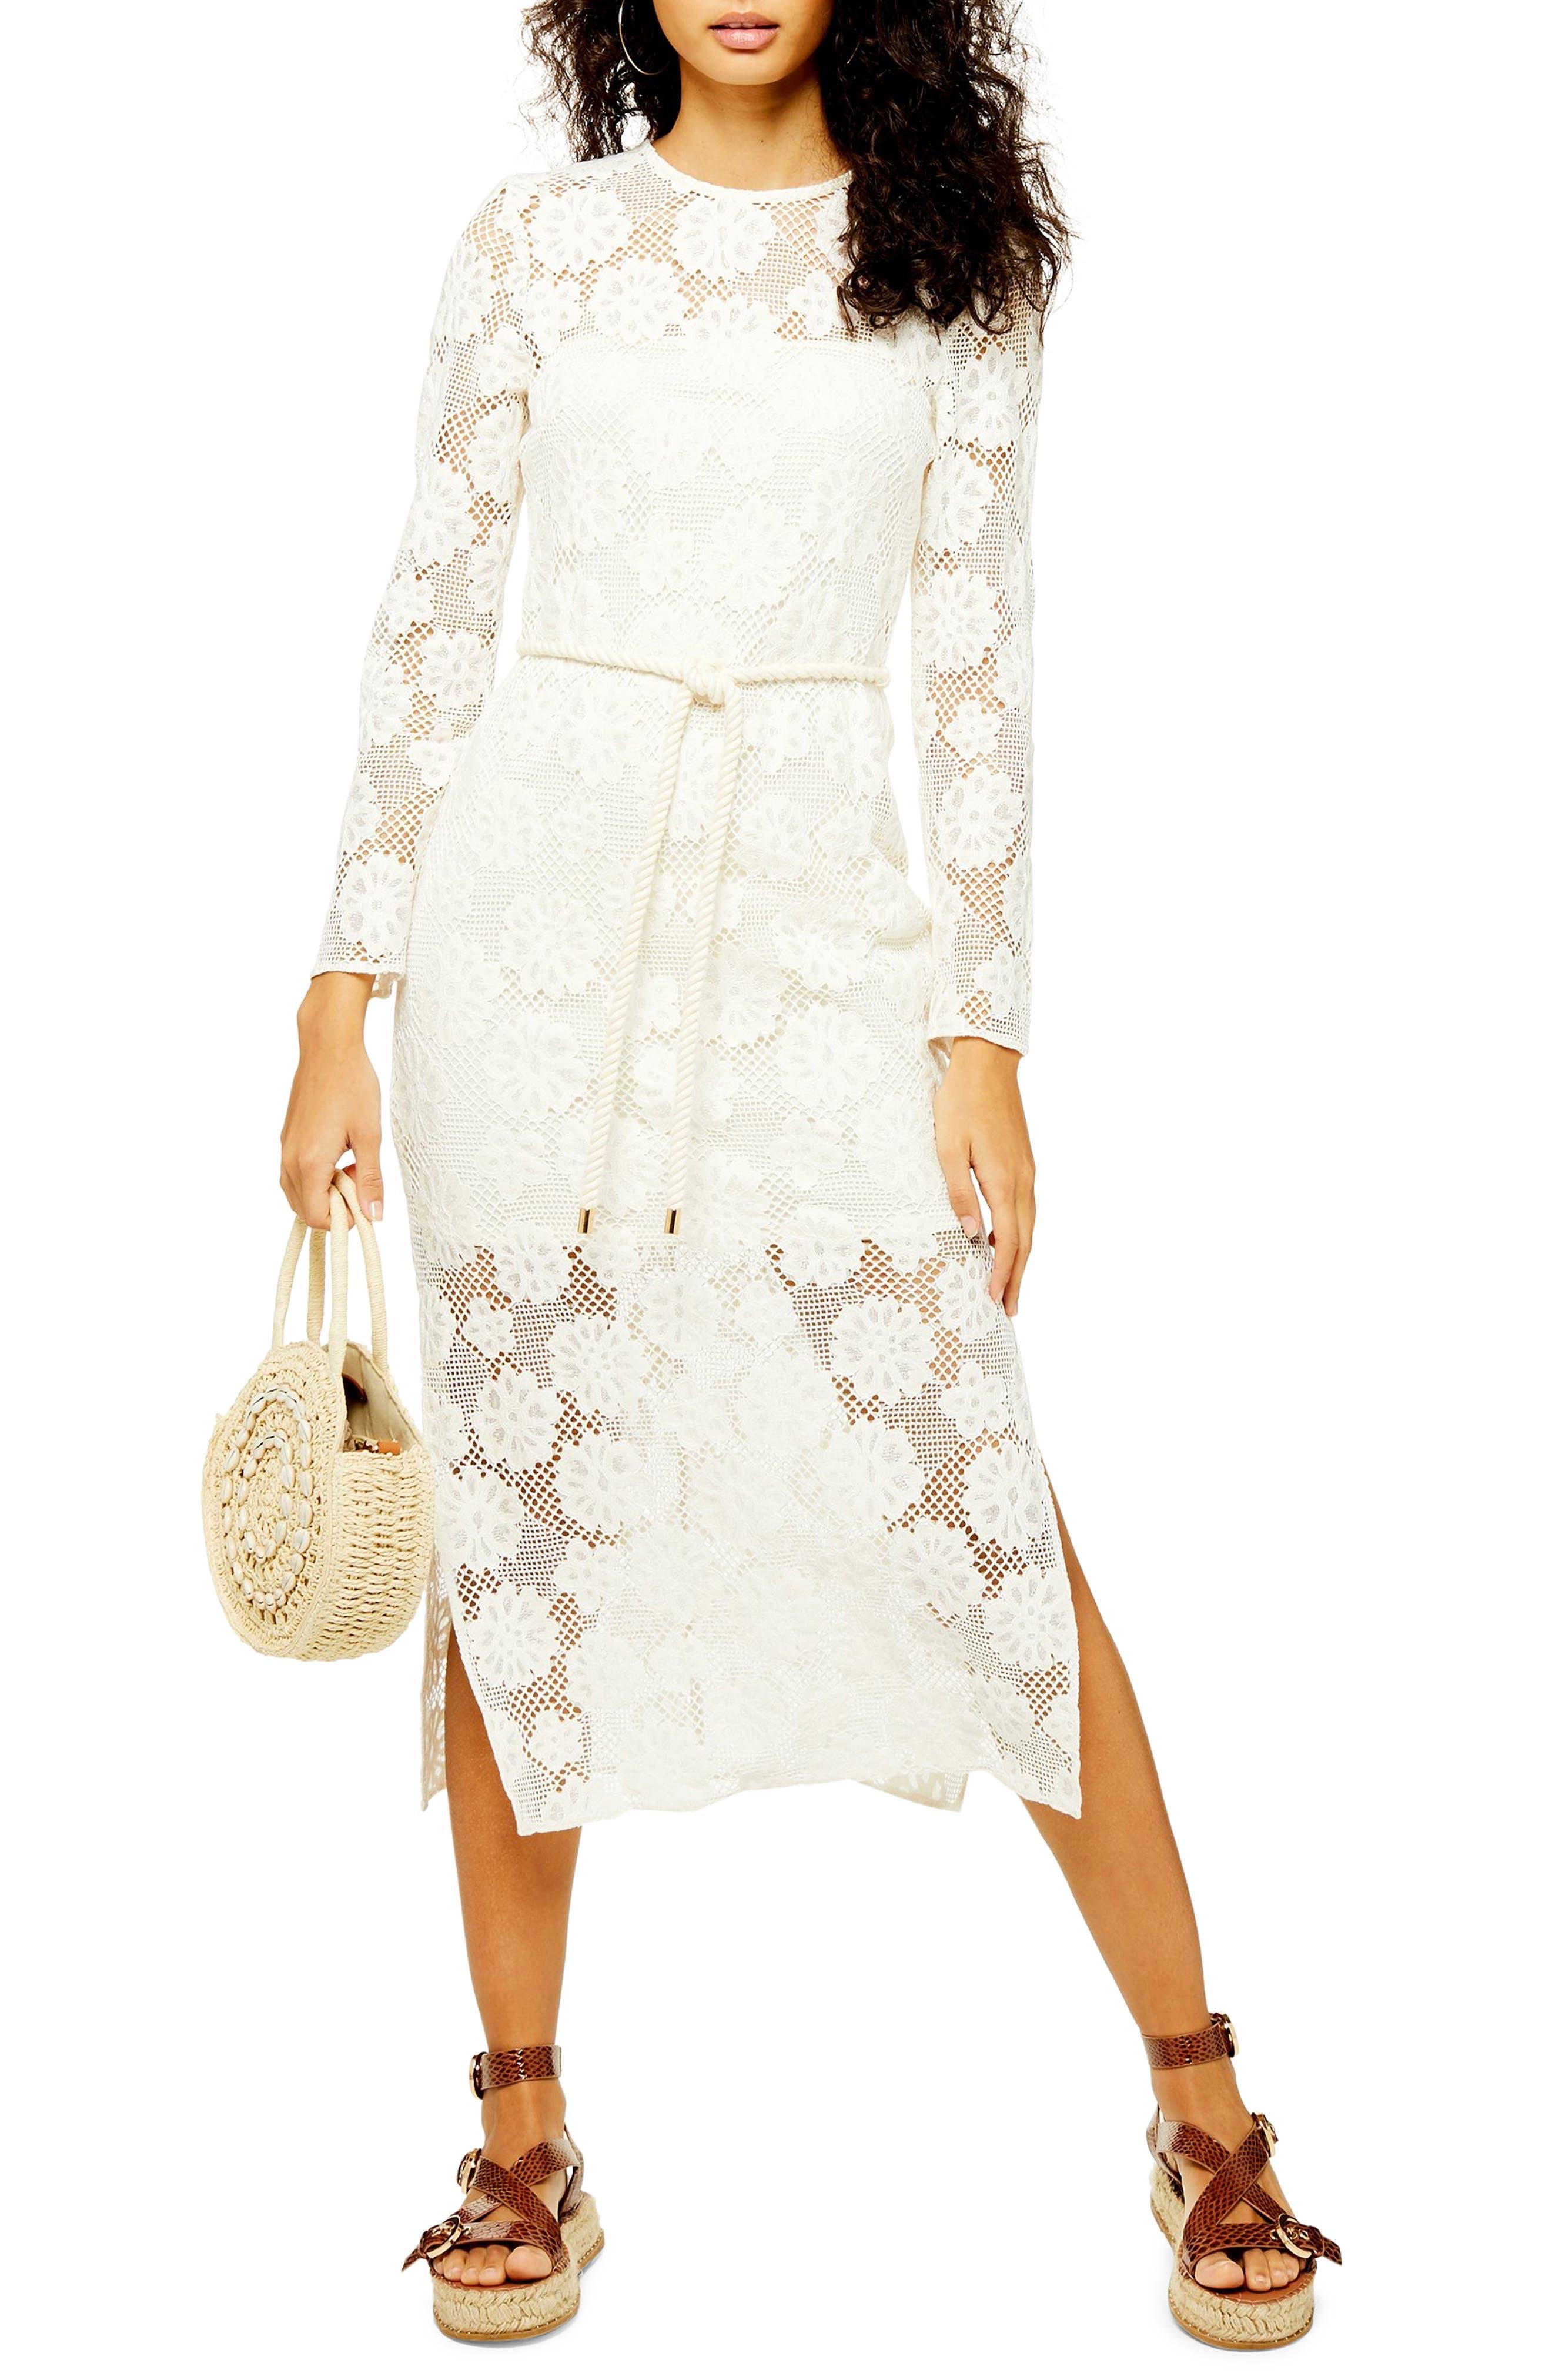 Topshop Lace Rope Belt Midi Dress, US (fits like 2-4) - Ivory